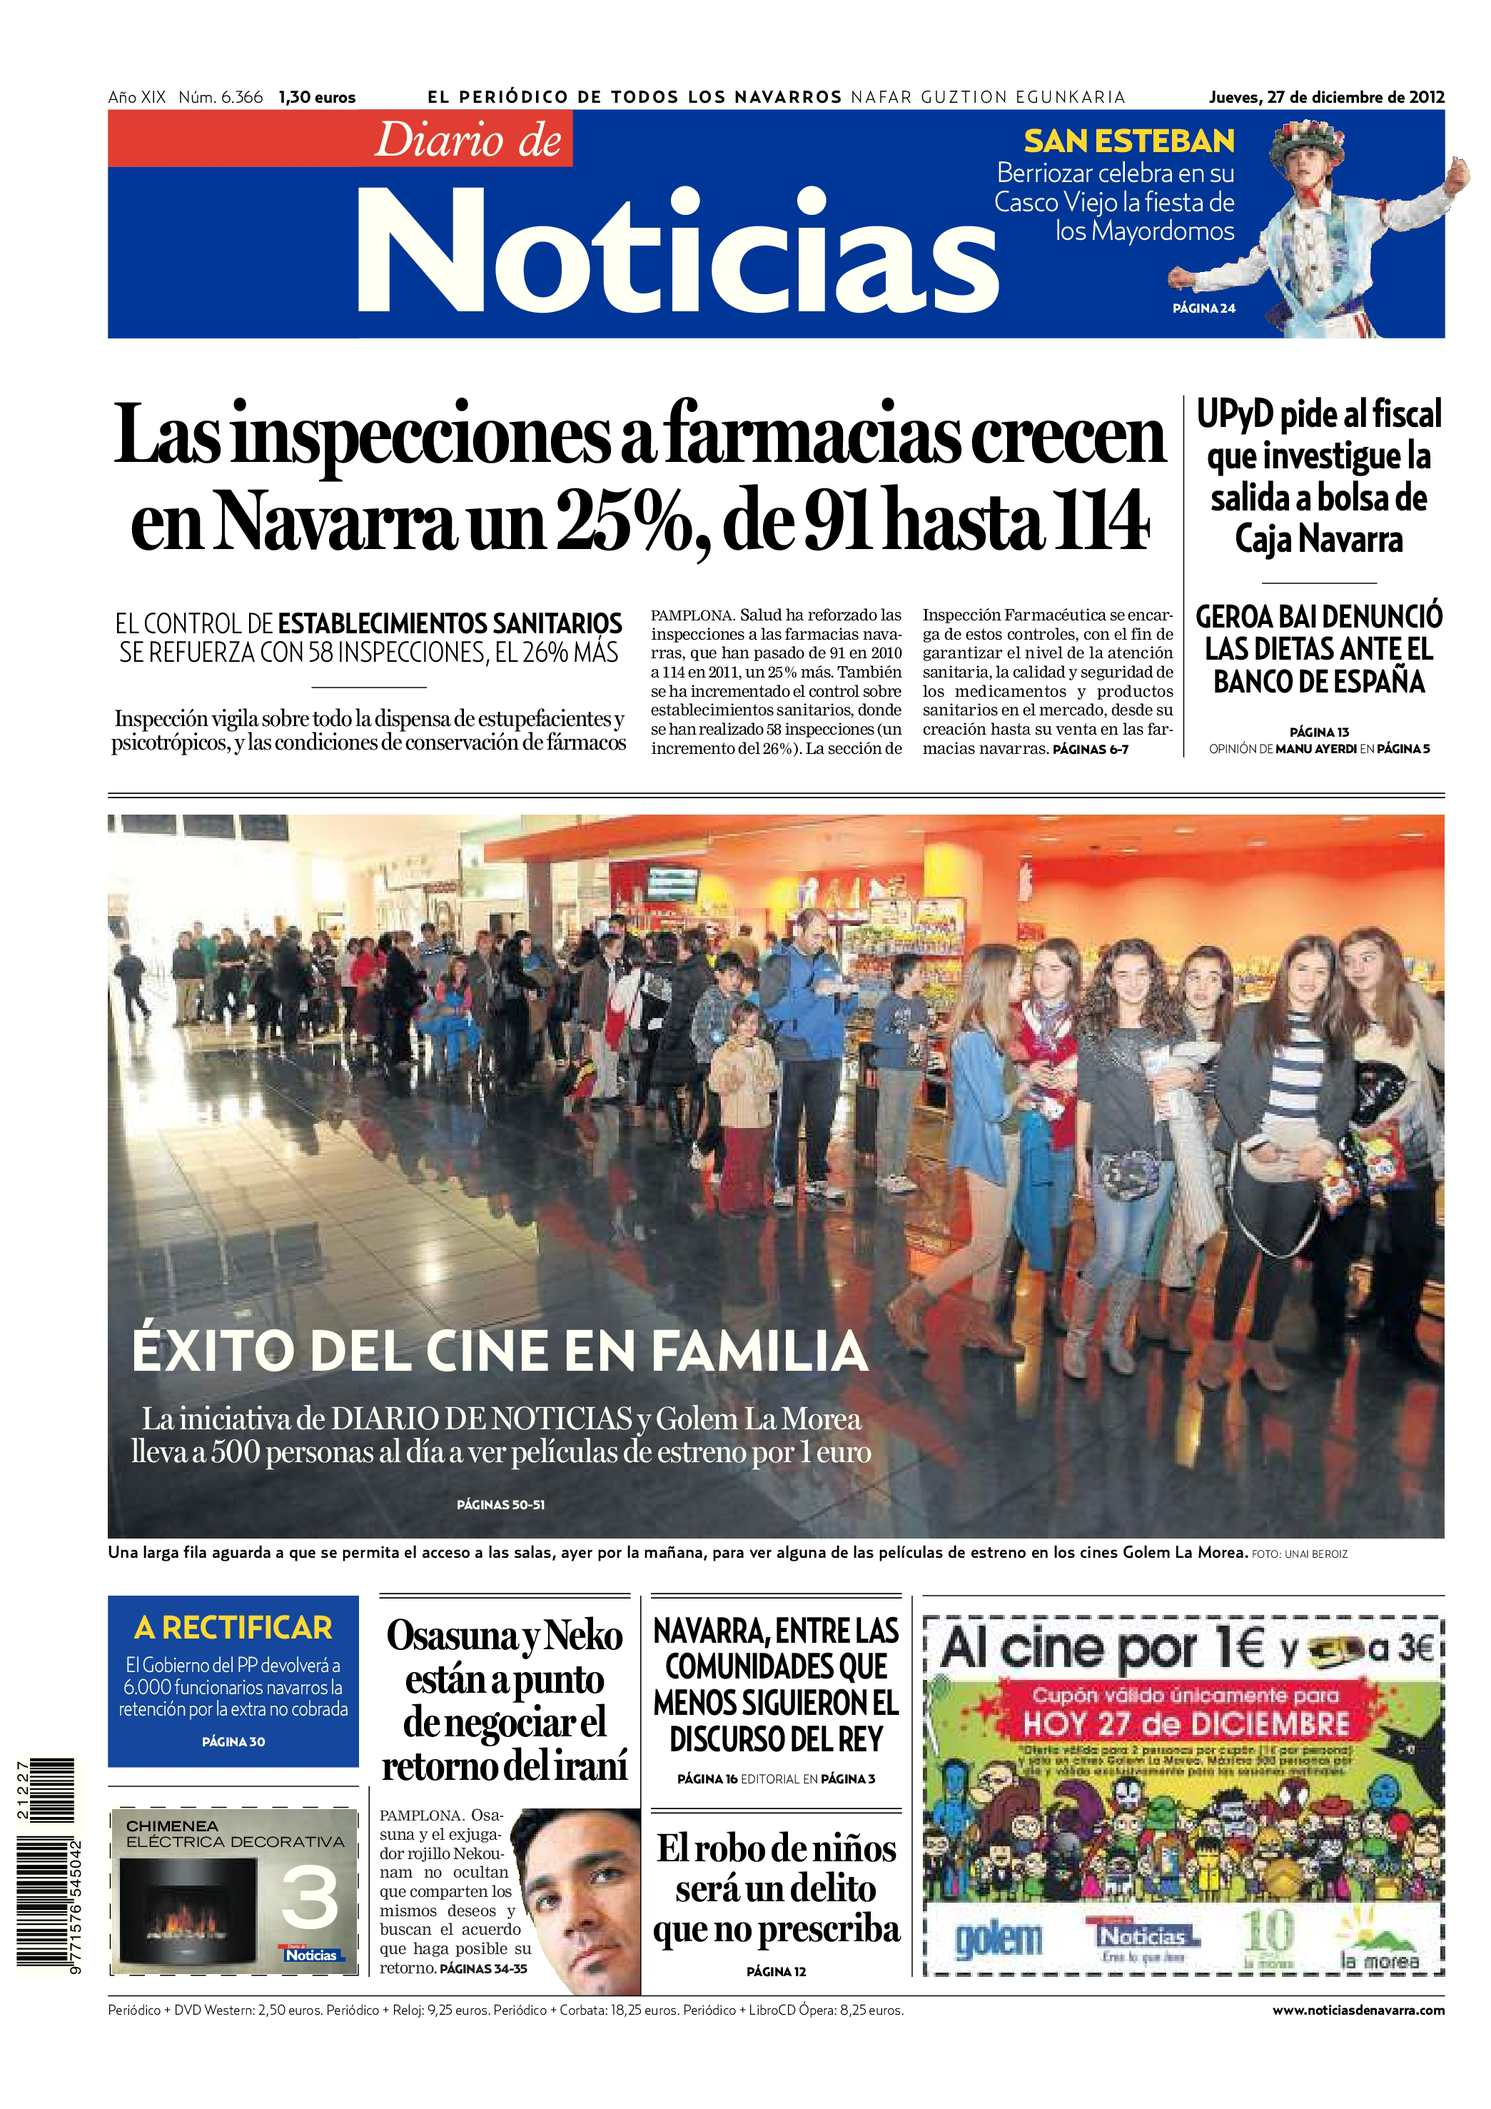 Calaméo - Diario de Noticias 20121227 efdda02d1db1